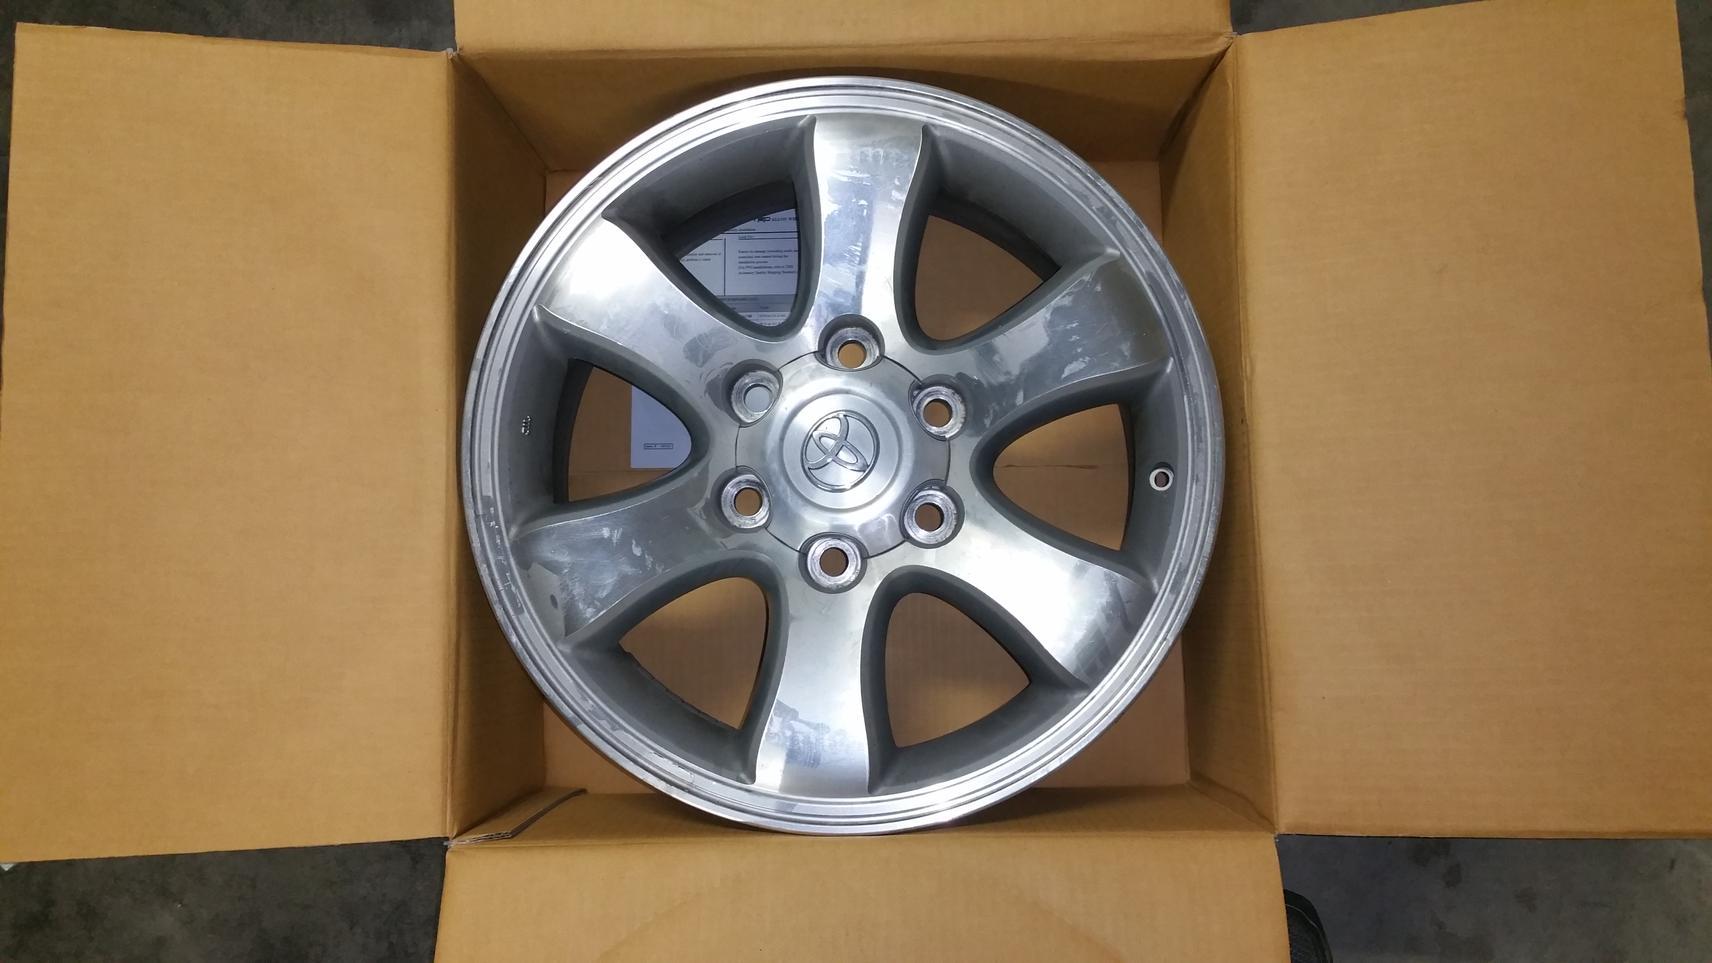 Fs 4 17inch sport rims 500 obo new mexico toyota for 17 inch d window wheels